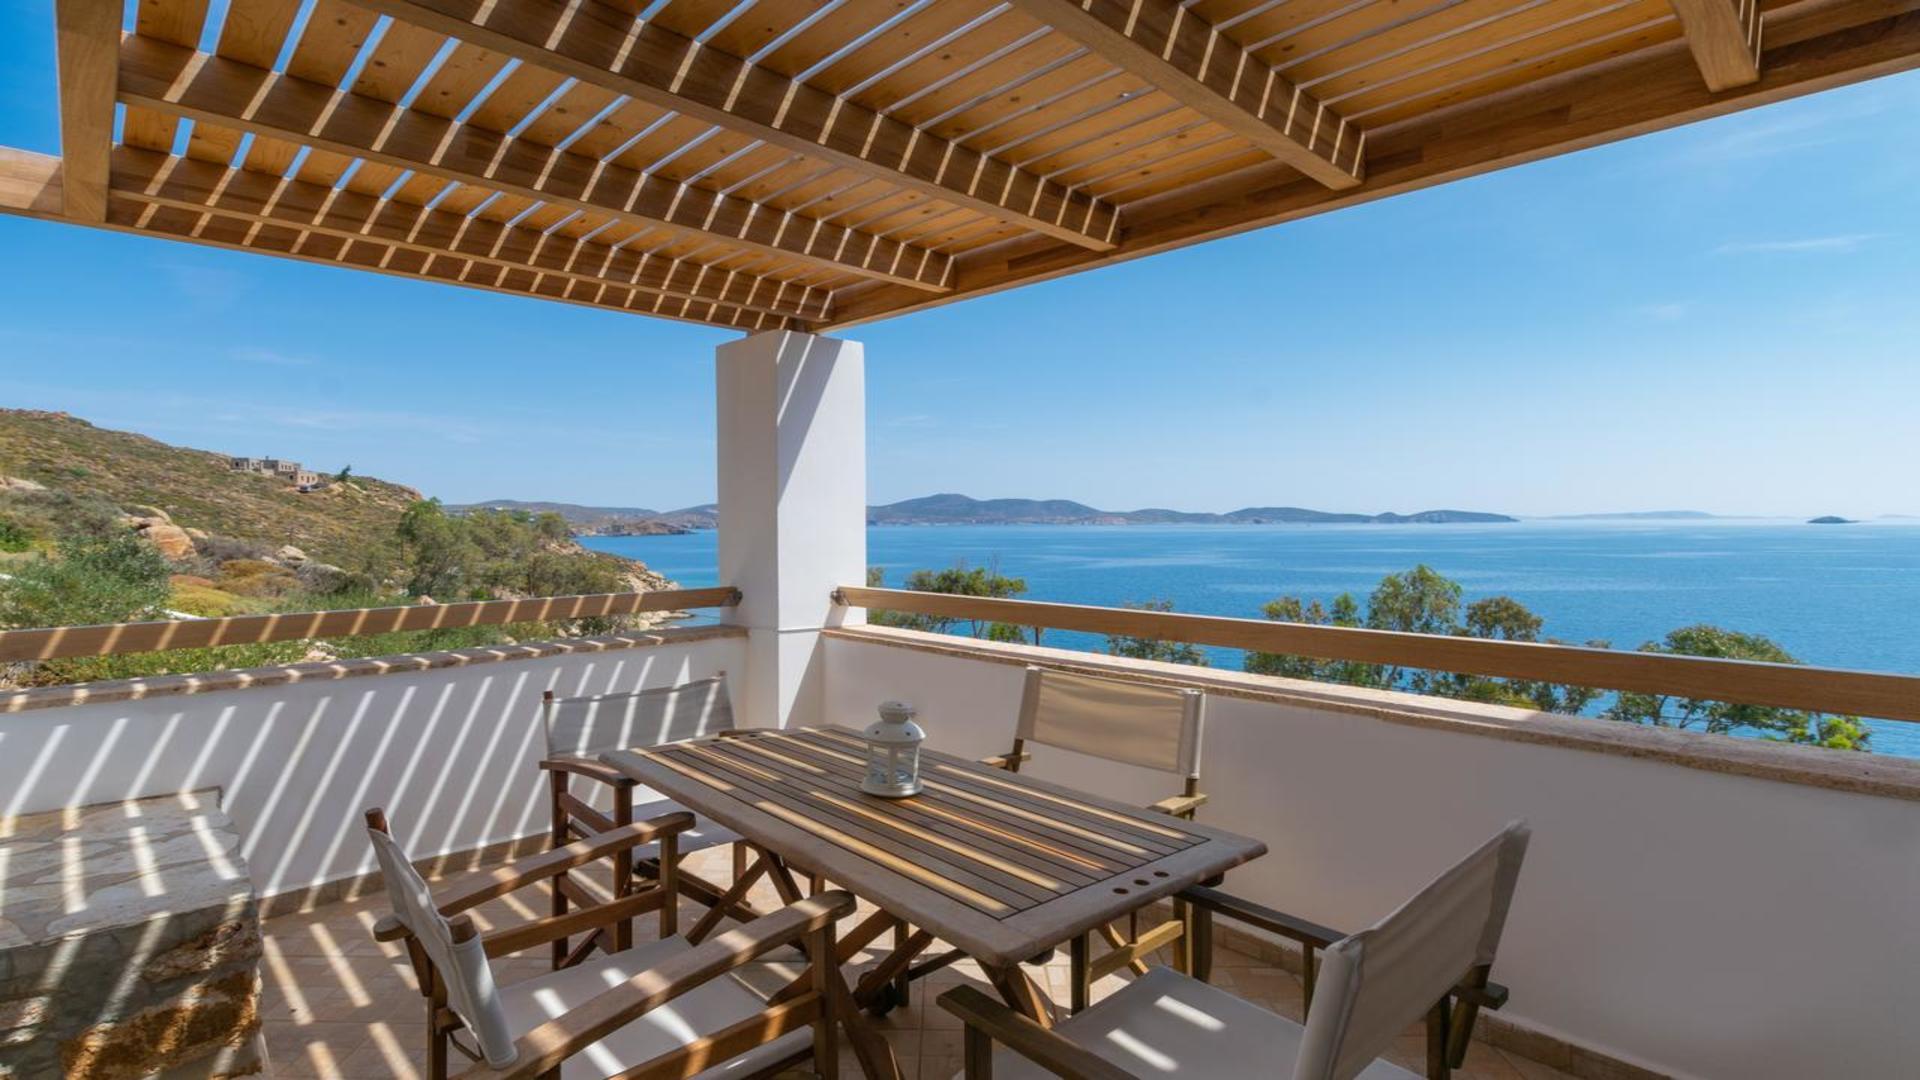 Balkon van kamer van appartementen Allotina Houses, Sapsila Bay, Patmos, Griekenland